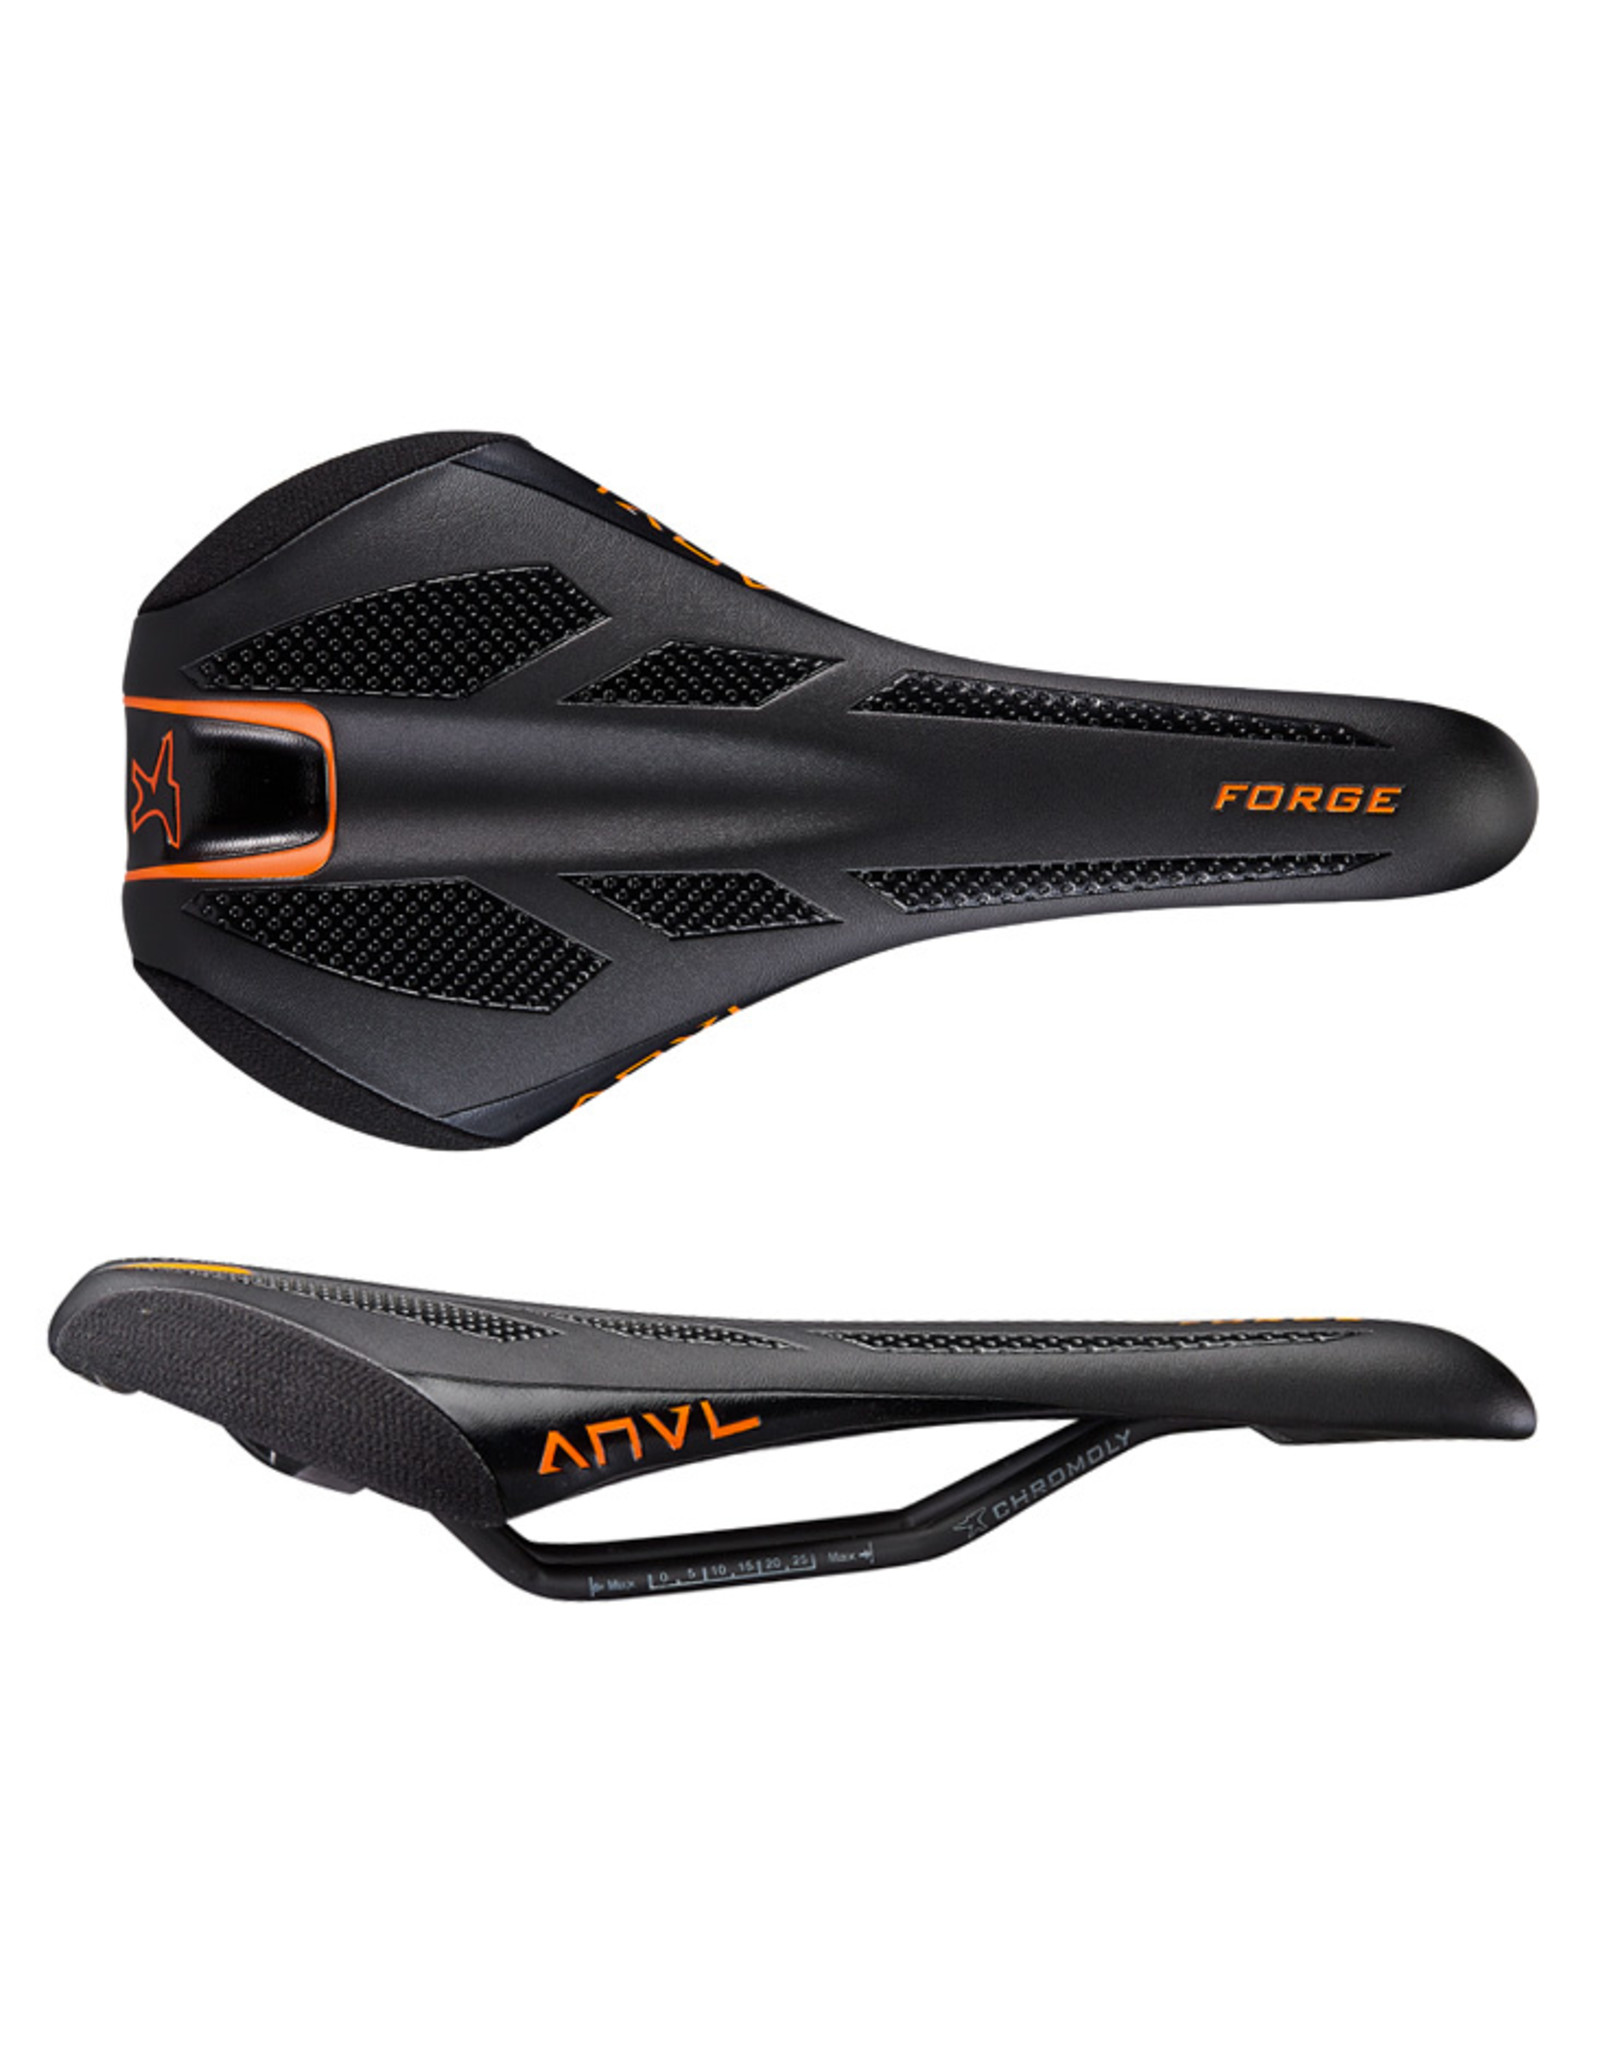 Anvl Anvl Forge Saddle, CrMo - Orange